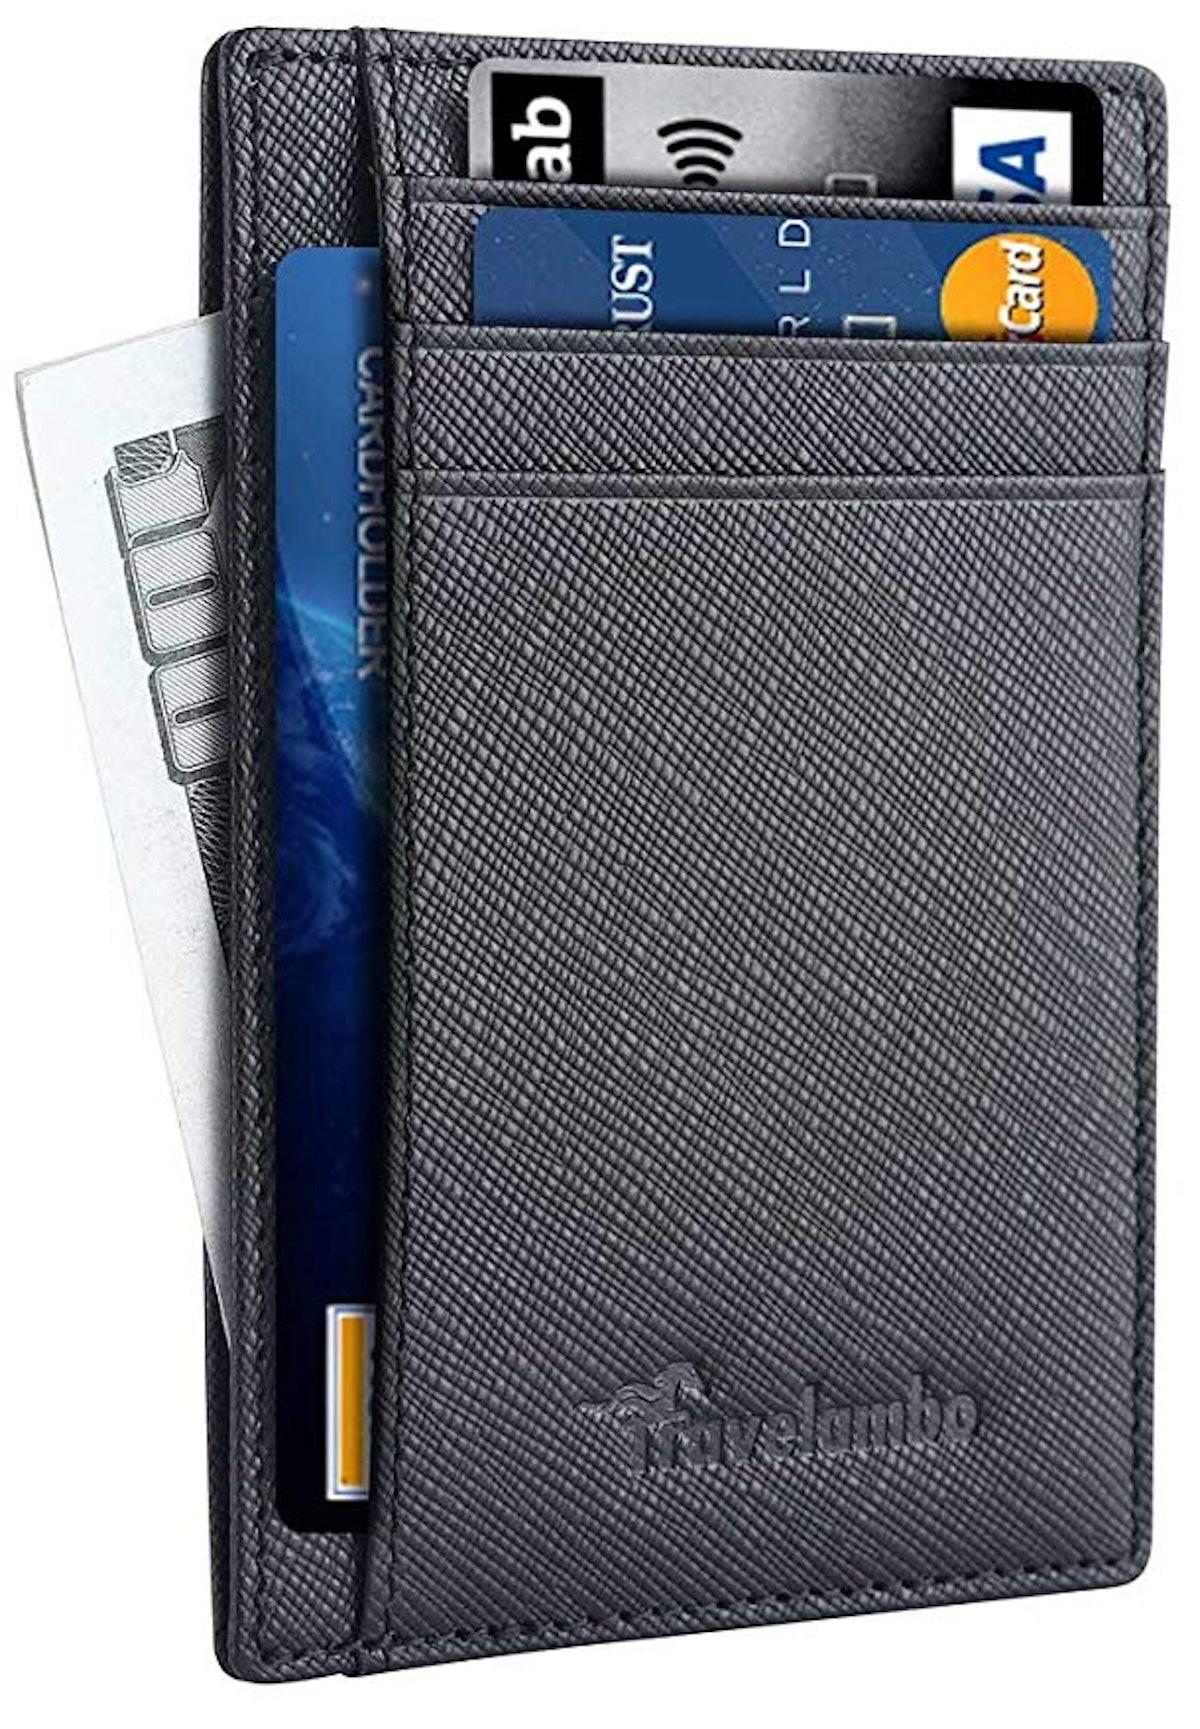 Travelambo Leather RFID Blocking Wallet